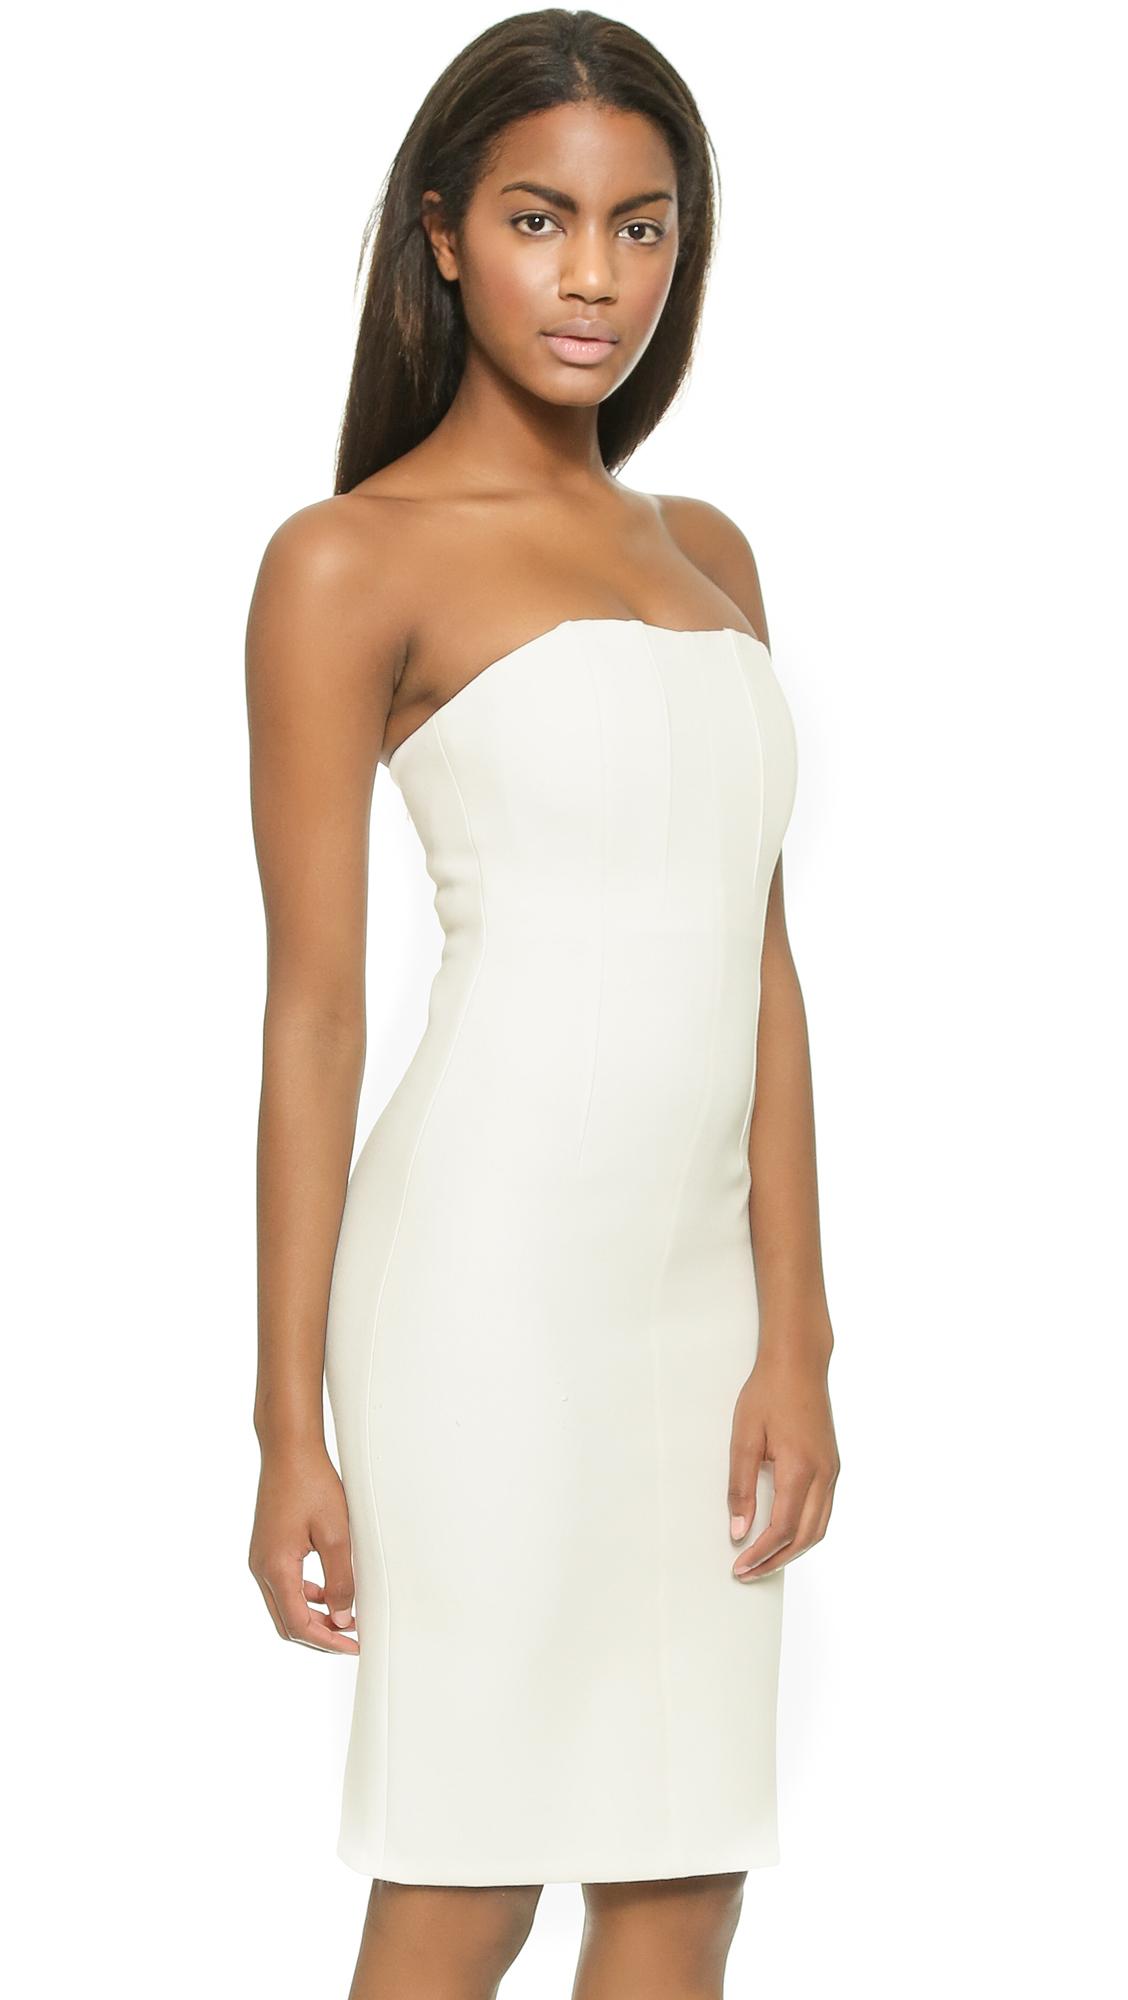 Alice   olivia Nita Slim Fitted Strapless Dress - Off White in ...